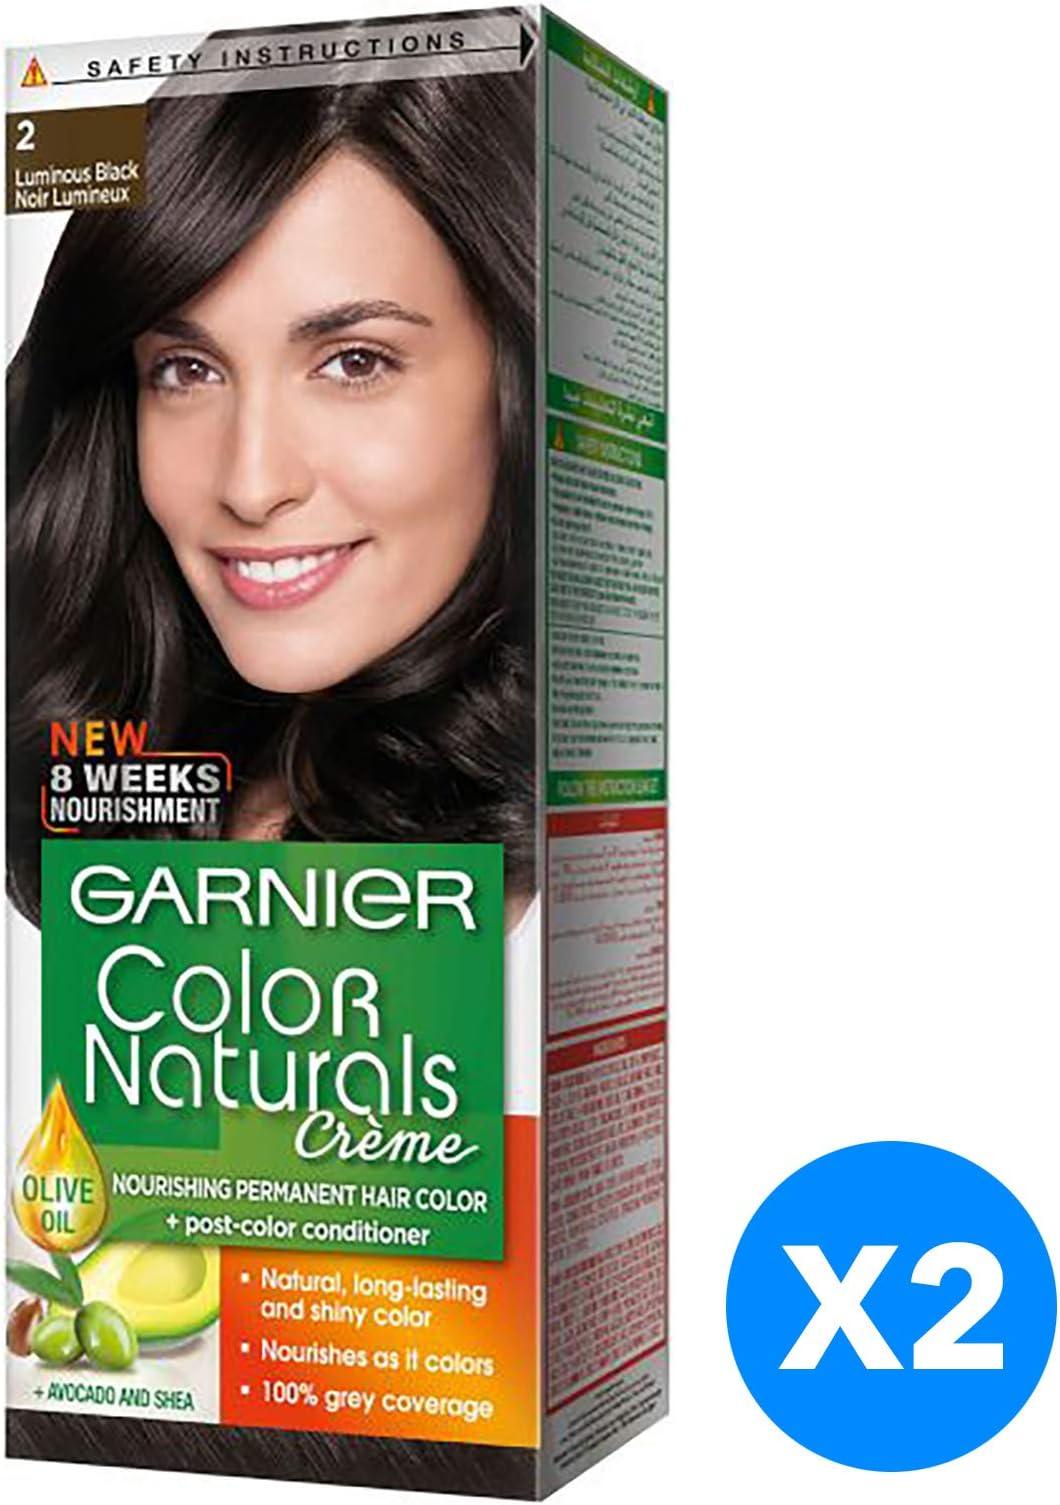 Garnier Color Naturals Shade 2 Twin Pack 100 Ml X 2 Price In Uae Amazon Uae Kanbkam